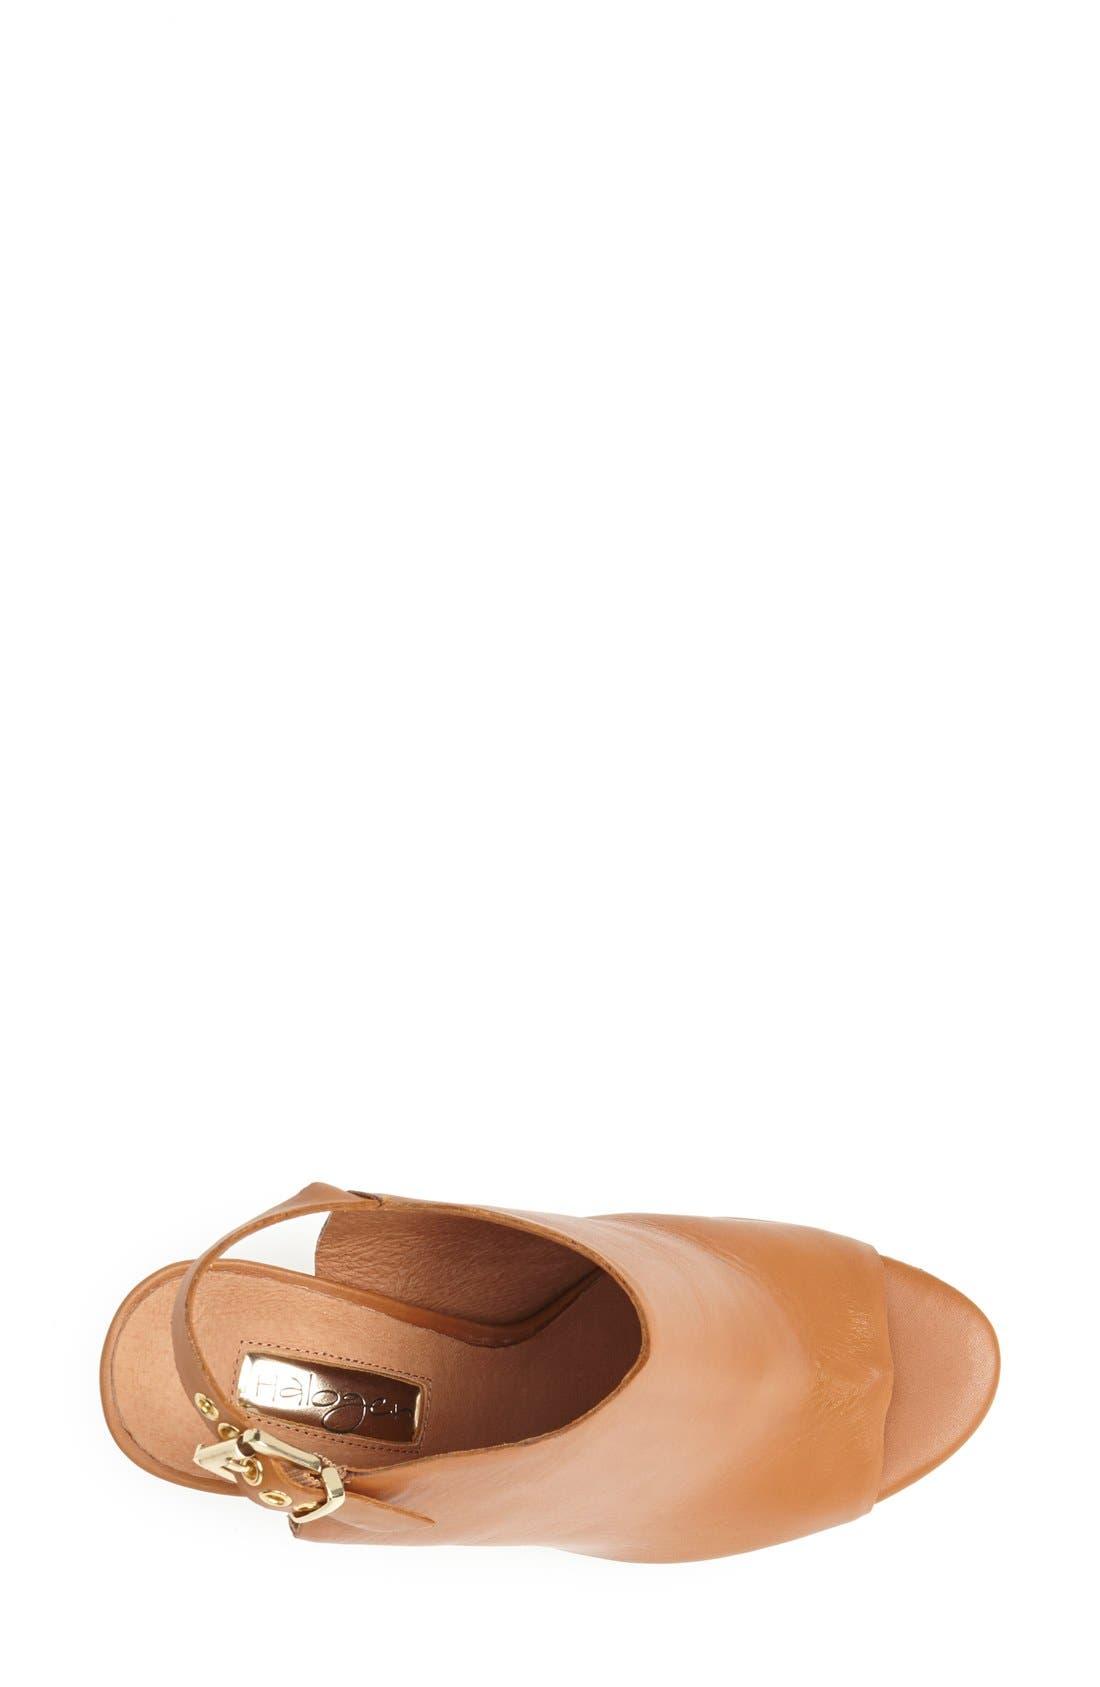 Alternate Image 3  - Halogen 'Sasha' Leather Sandal (Women)